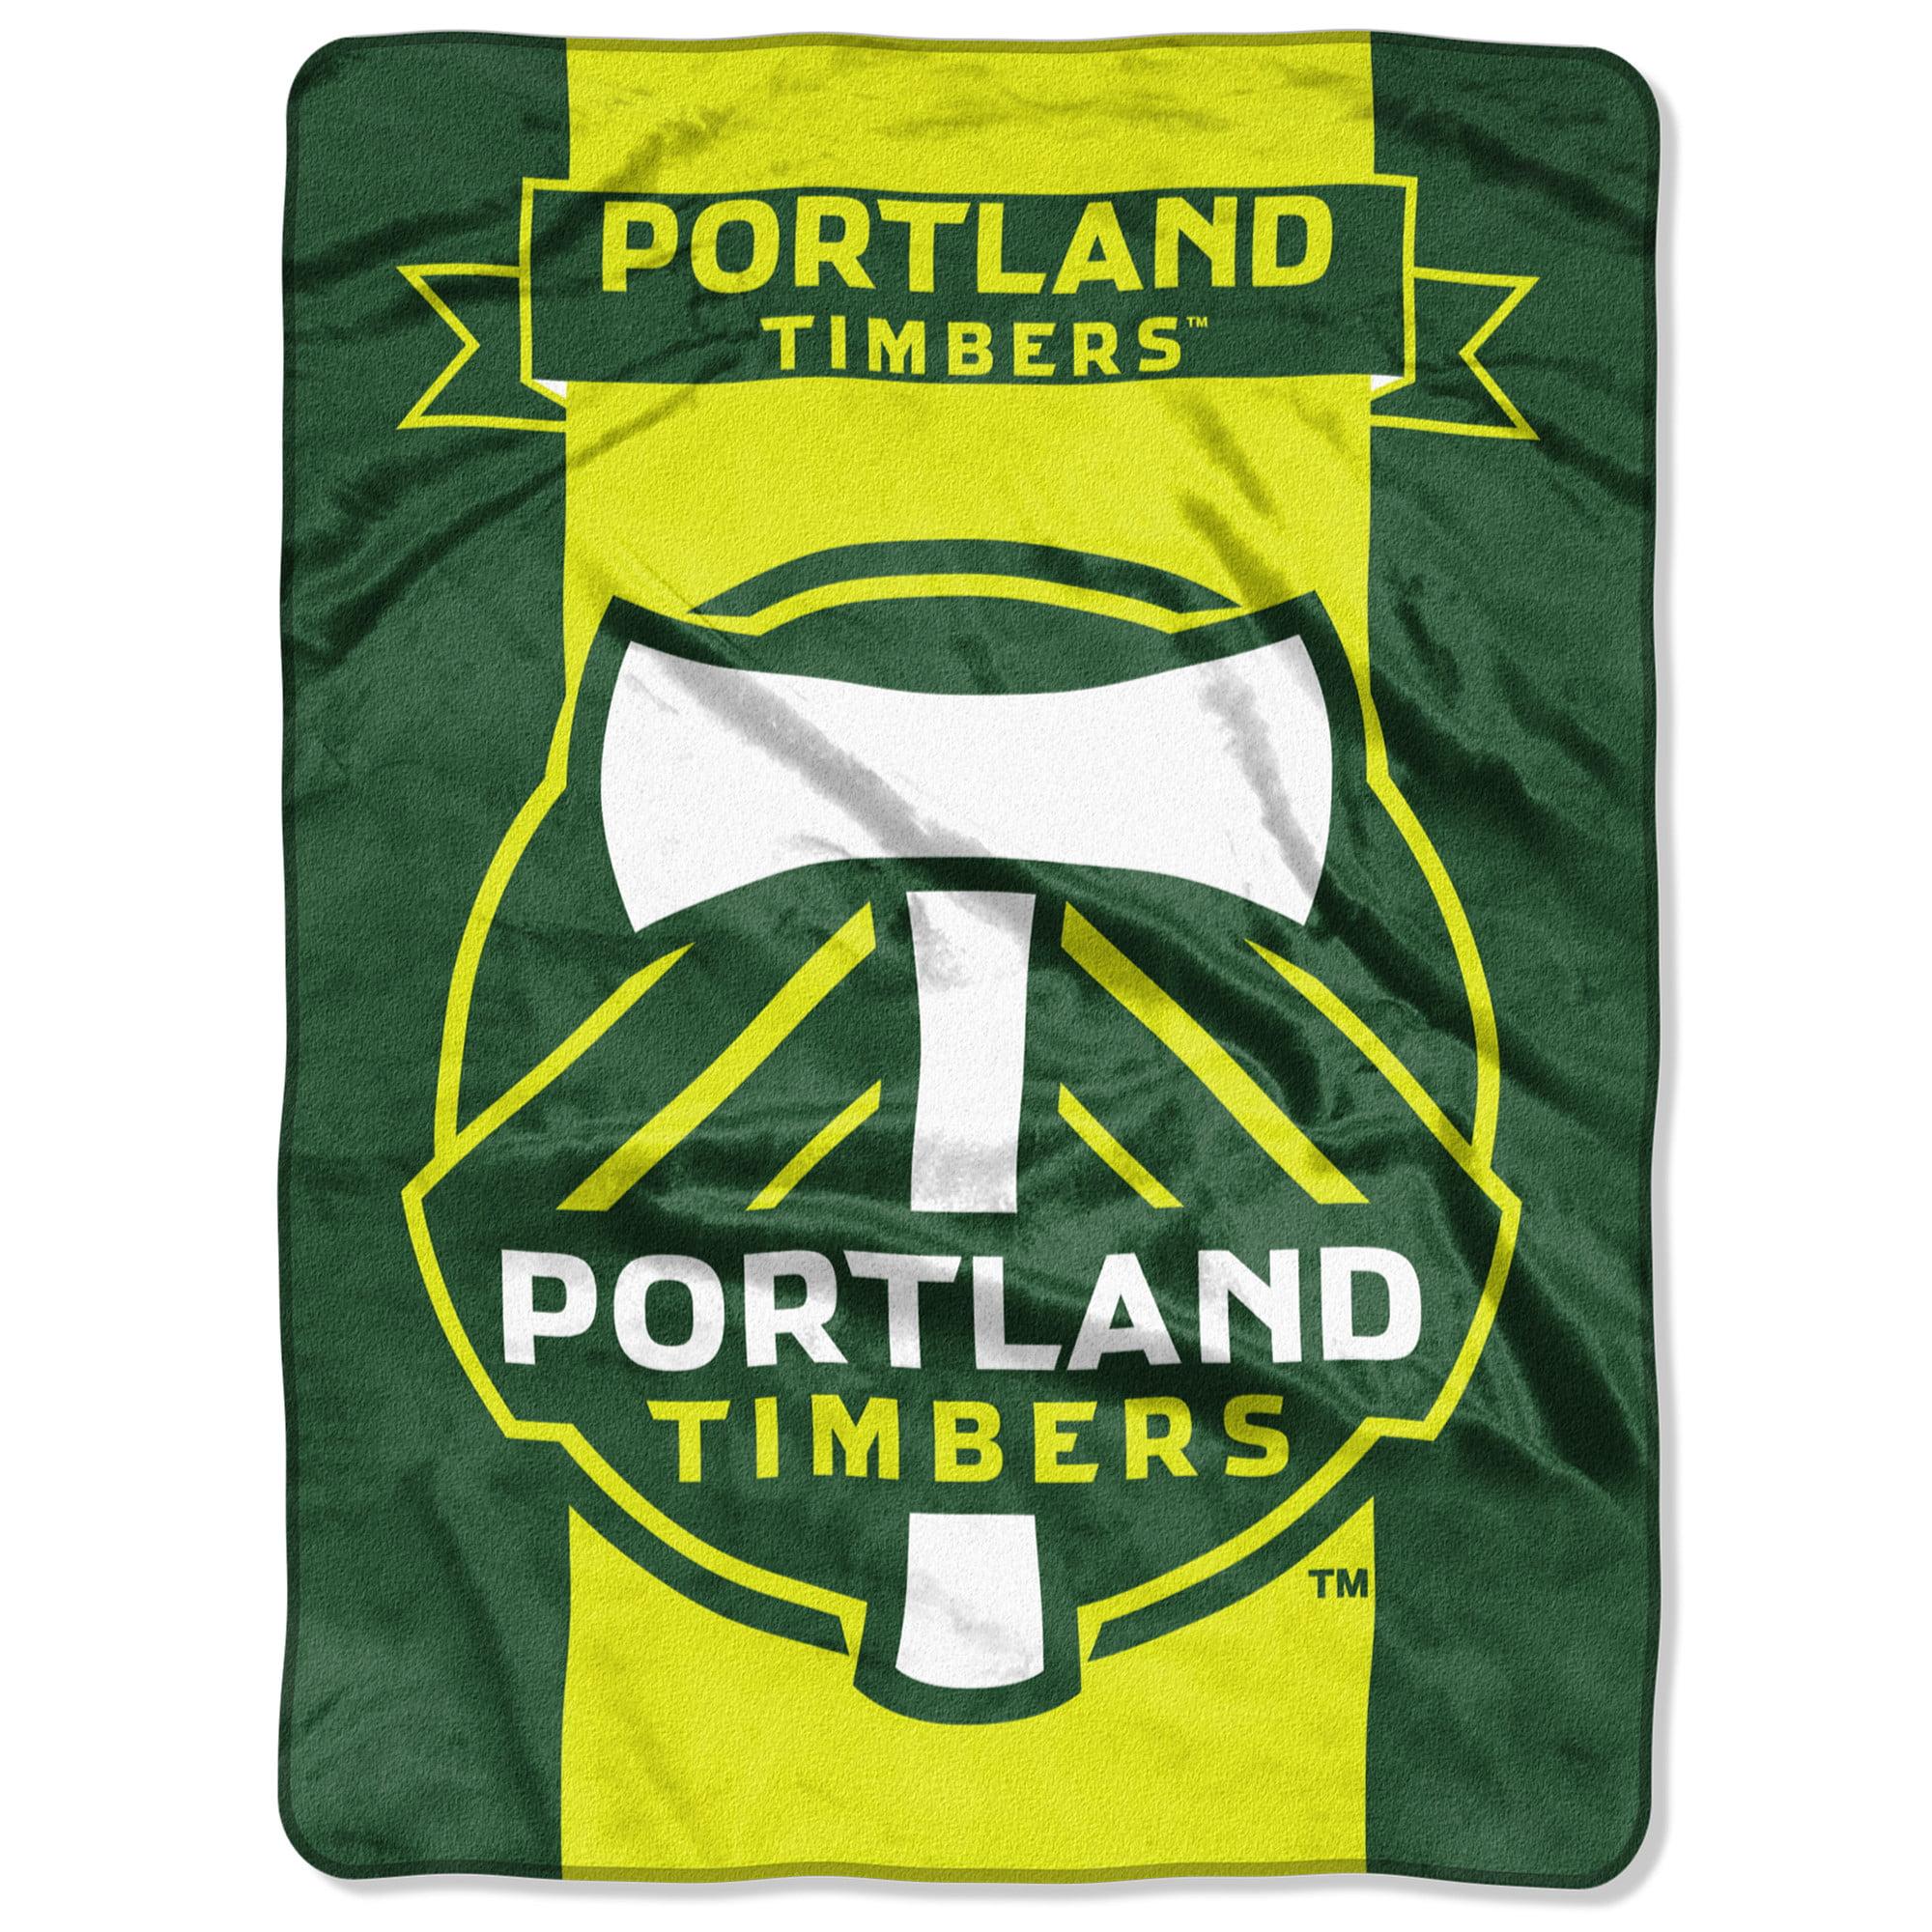 "Portland Timbers The Northwest Company 60"" x 80"" Raschel Throw Blanket - Green - No Size"